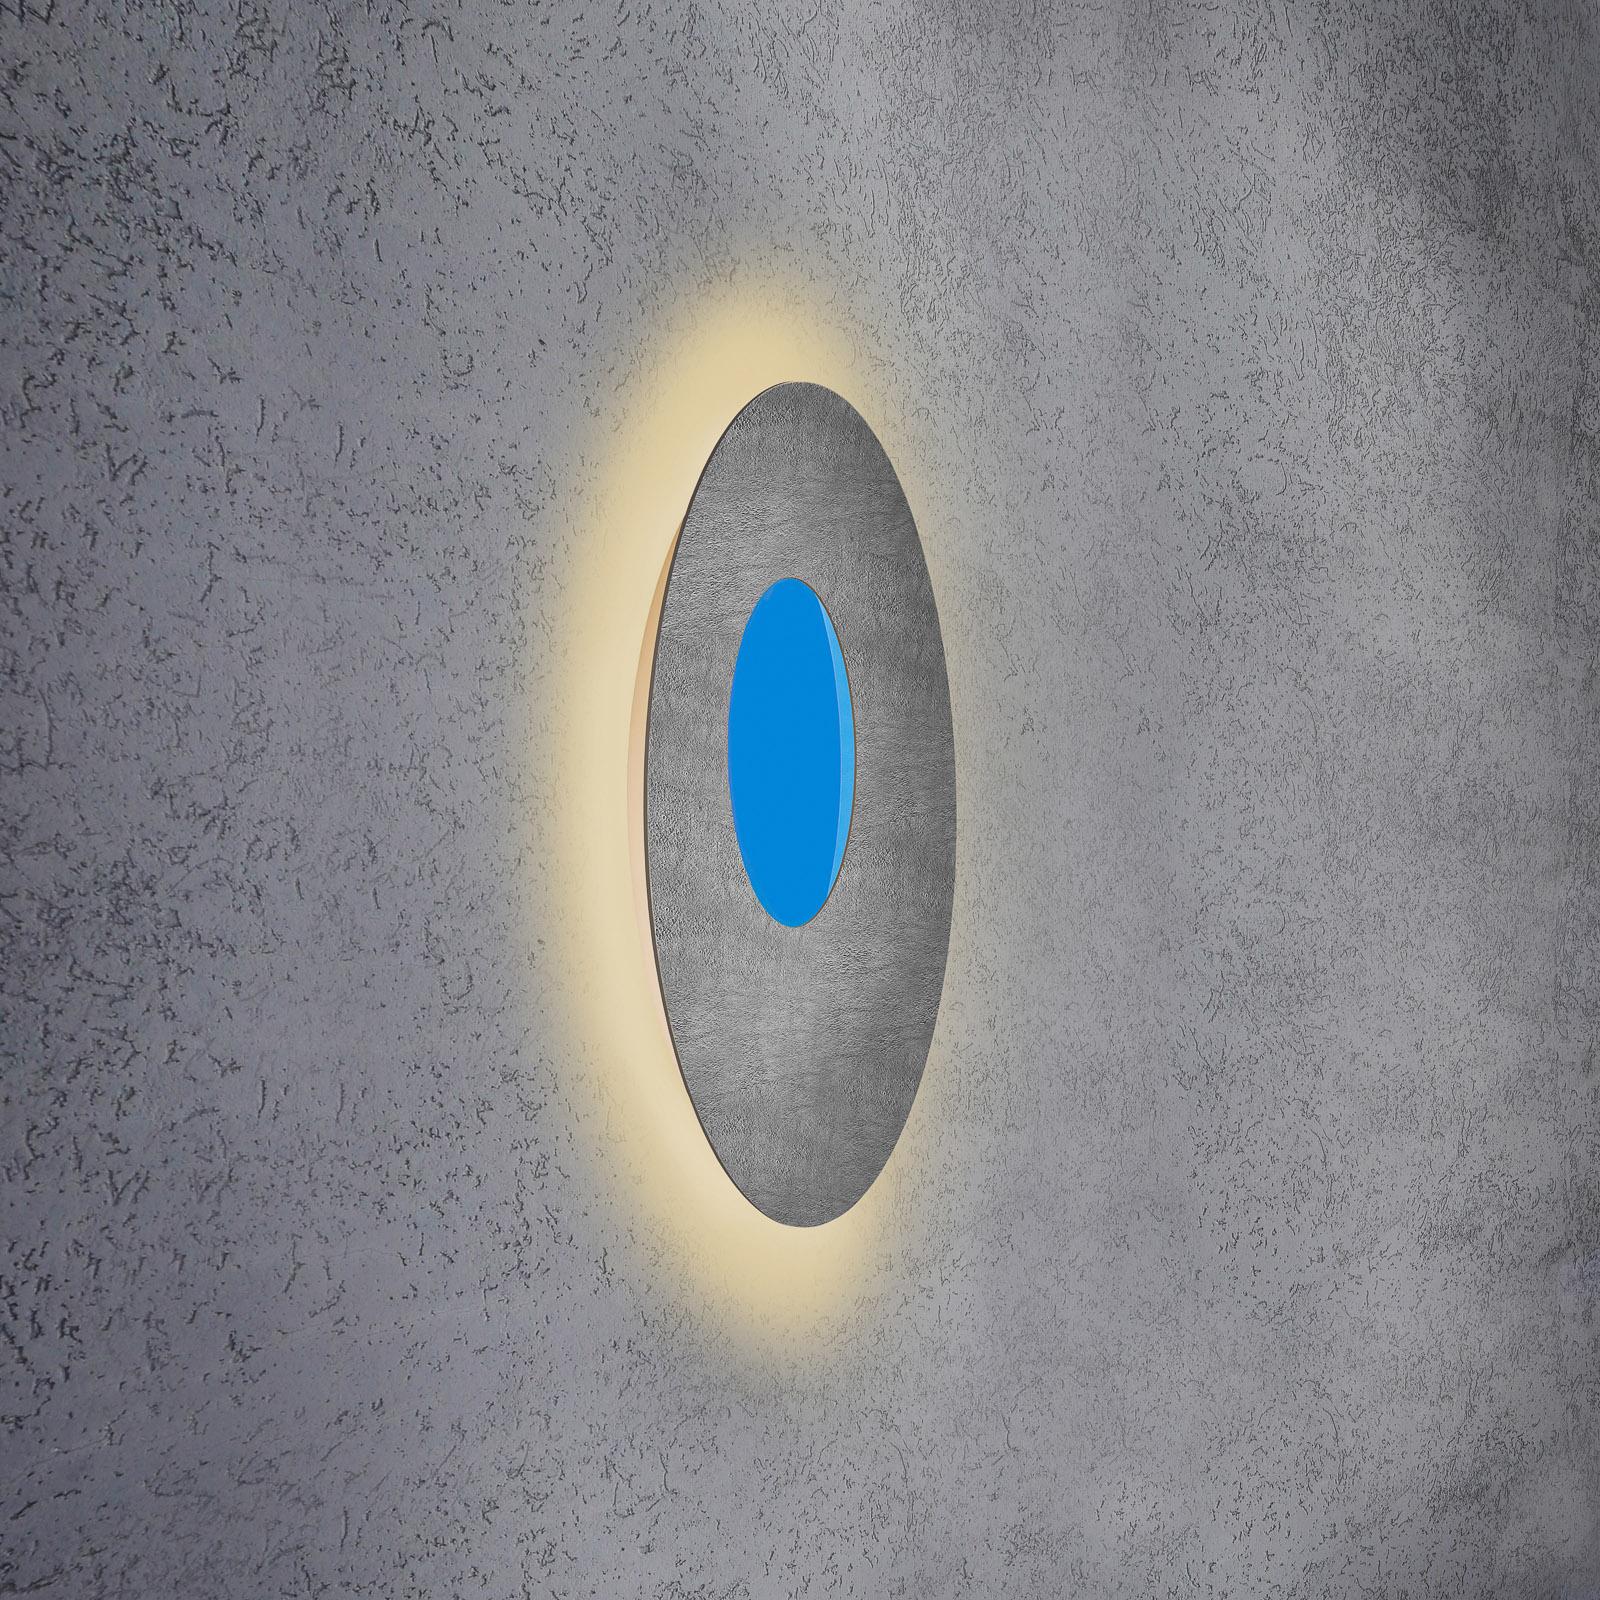 Escale Blade Open LED-Wandlampe RGB+W Beton Ø59cm